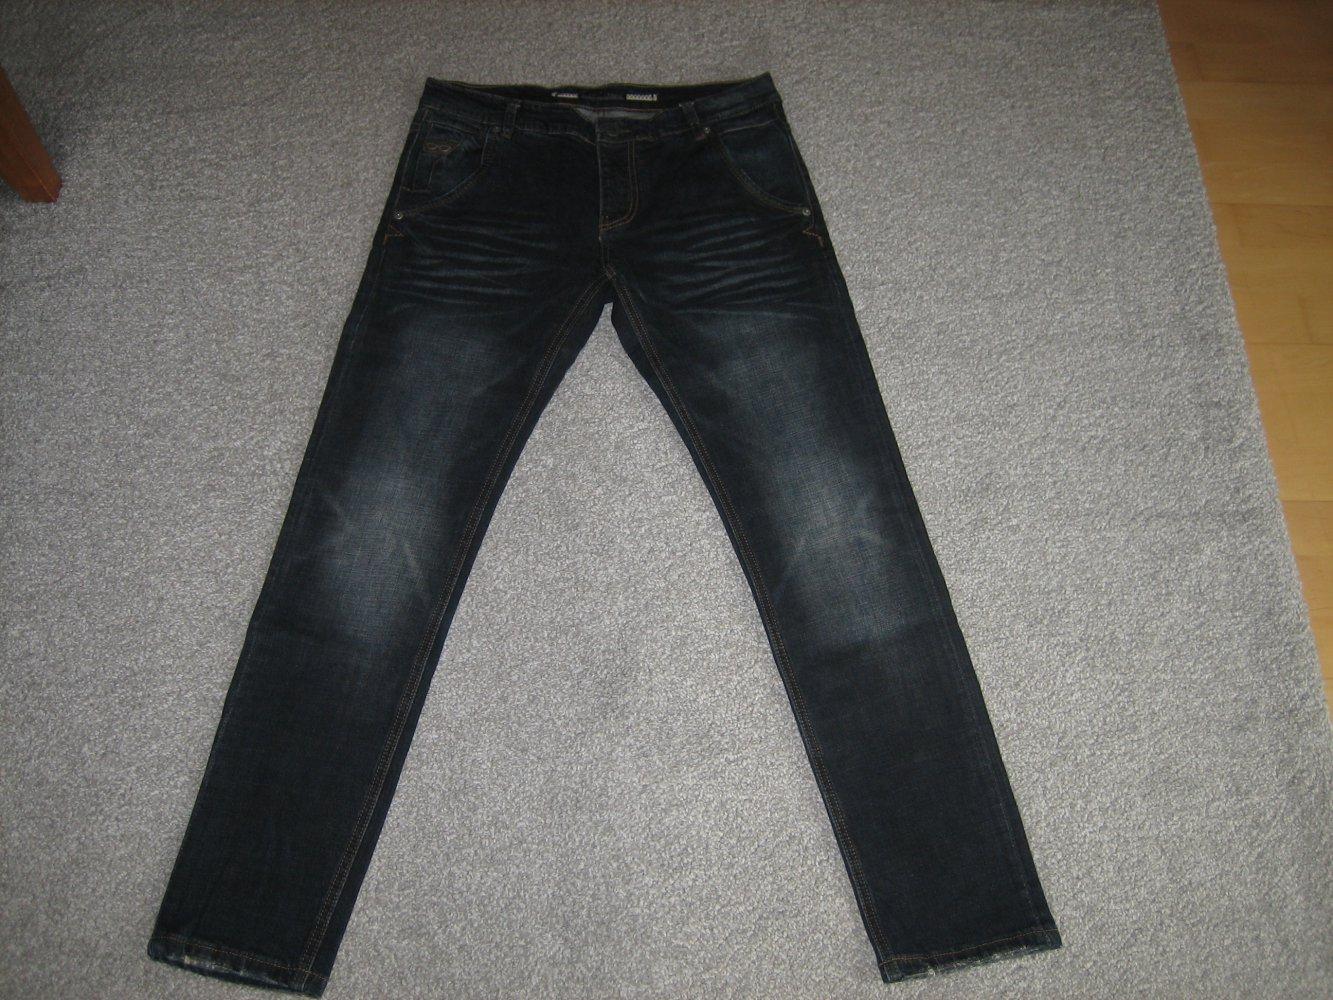 Neue, lässige Herren Jeans Gr. 4850 schmale, super Passform kombistark!